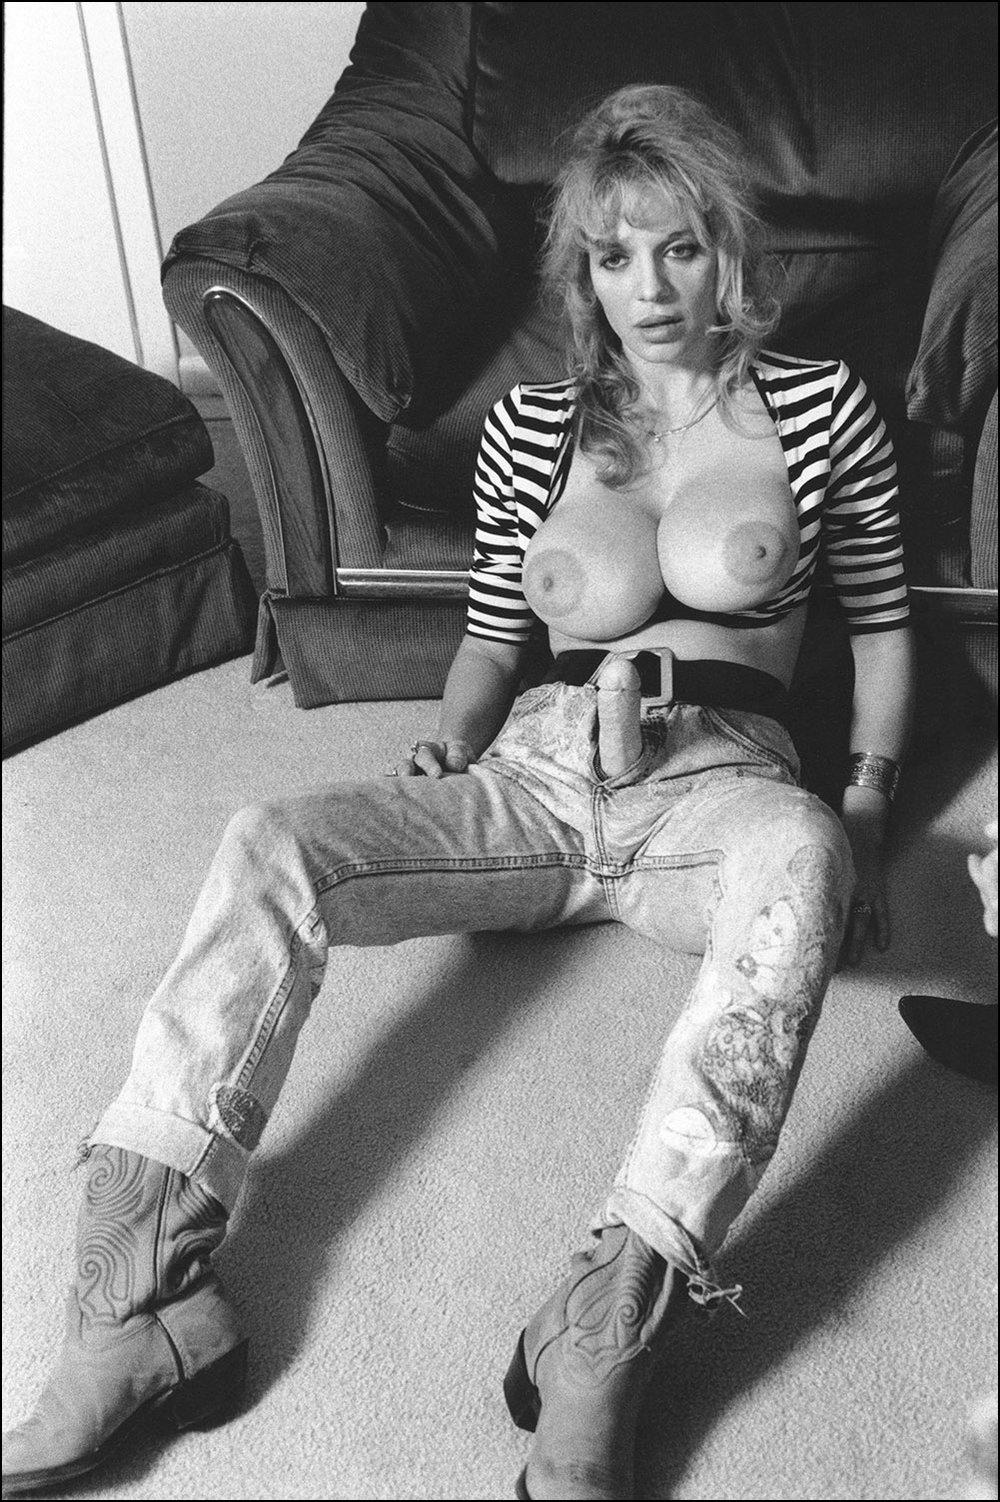 Strap on Sally, 1993